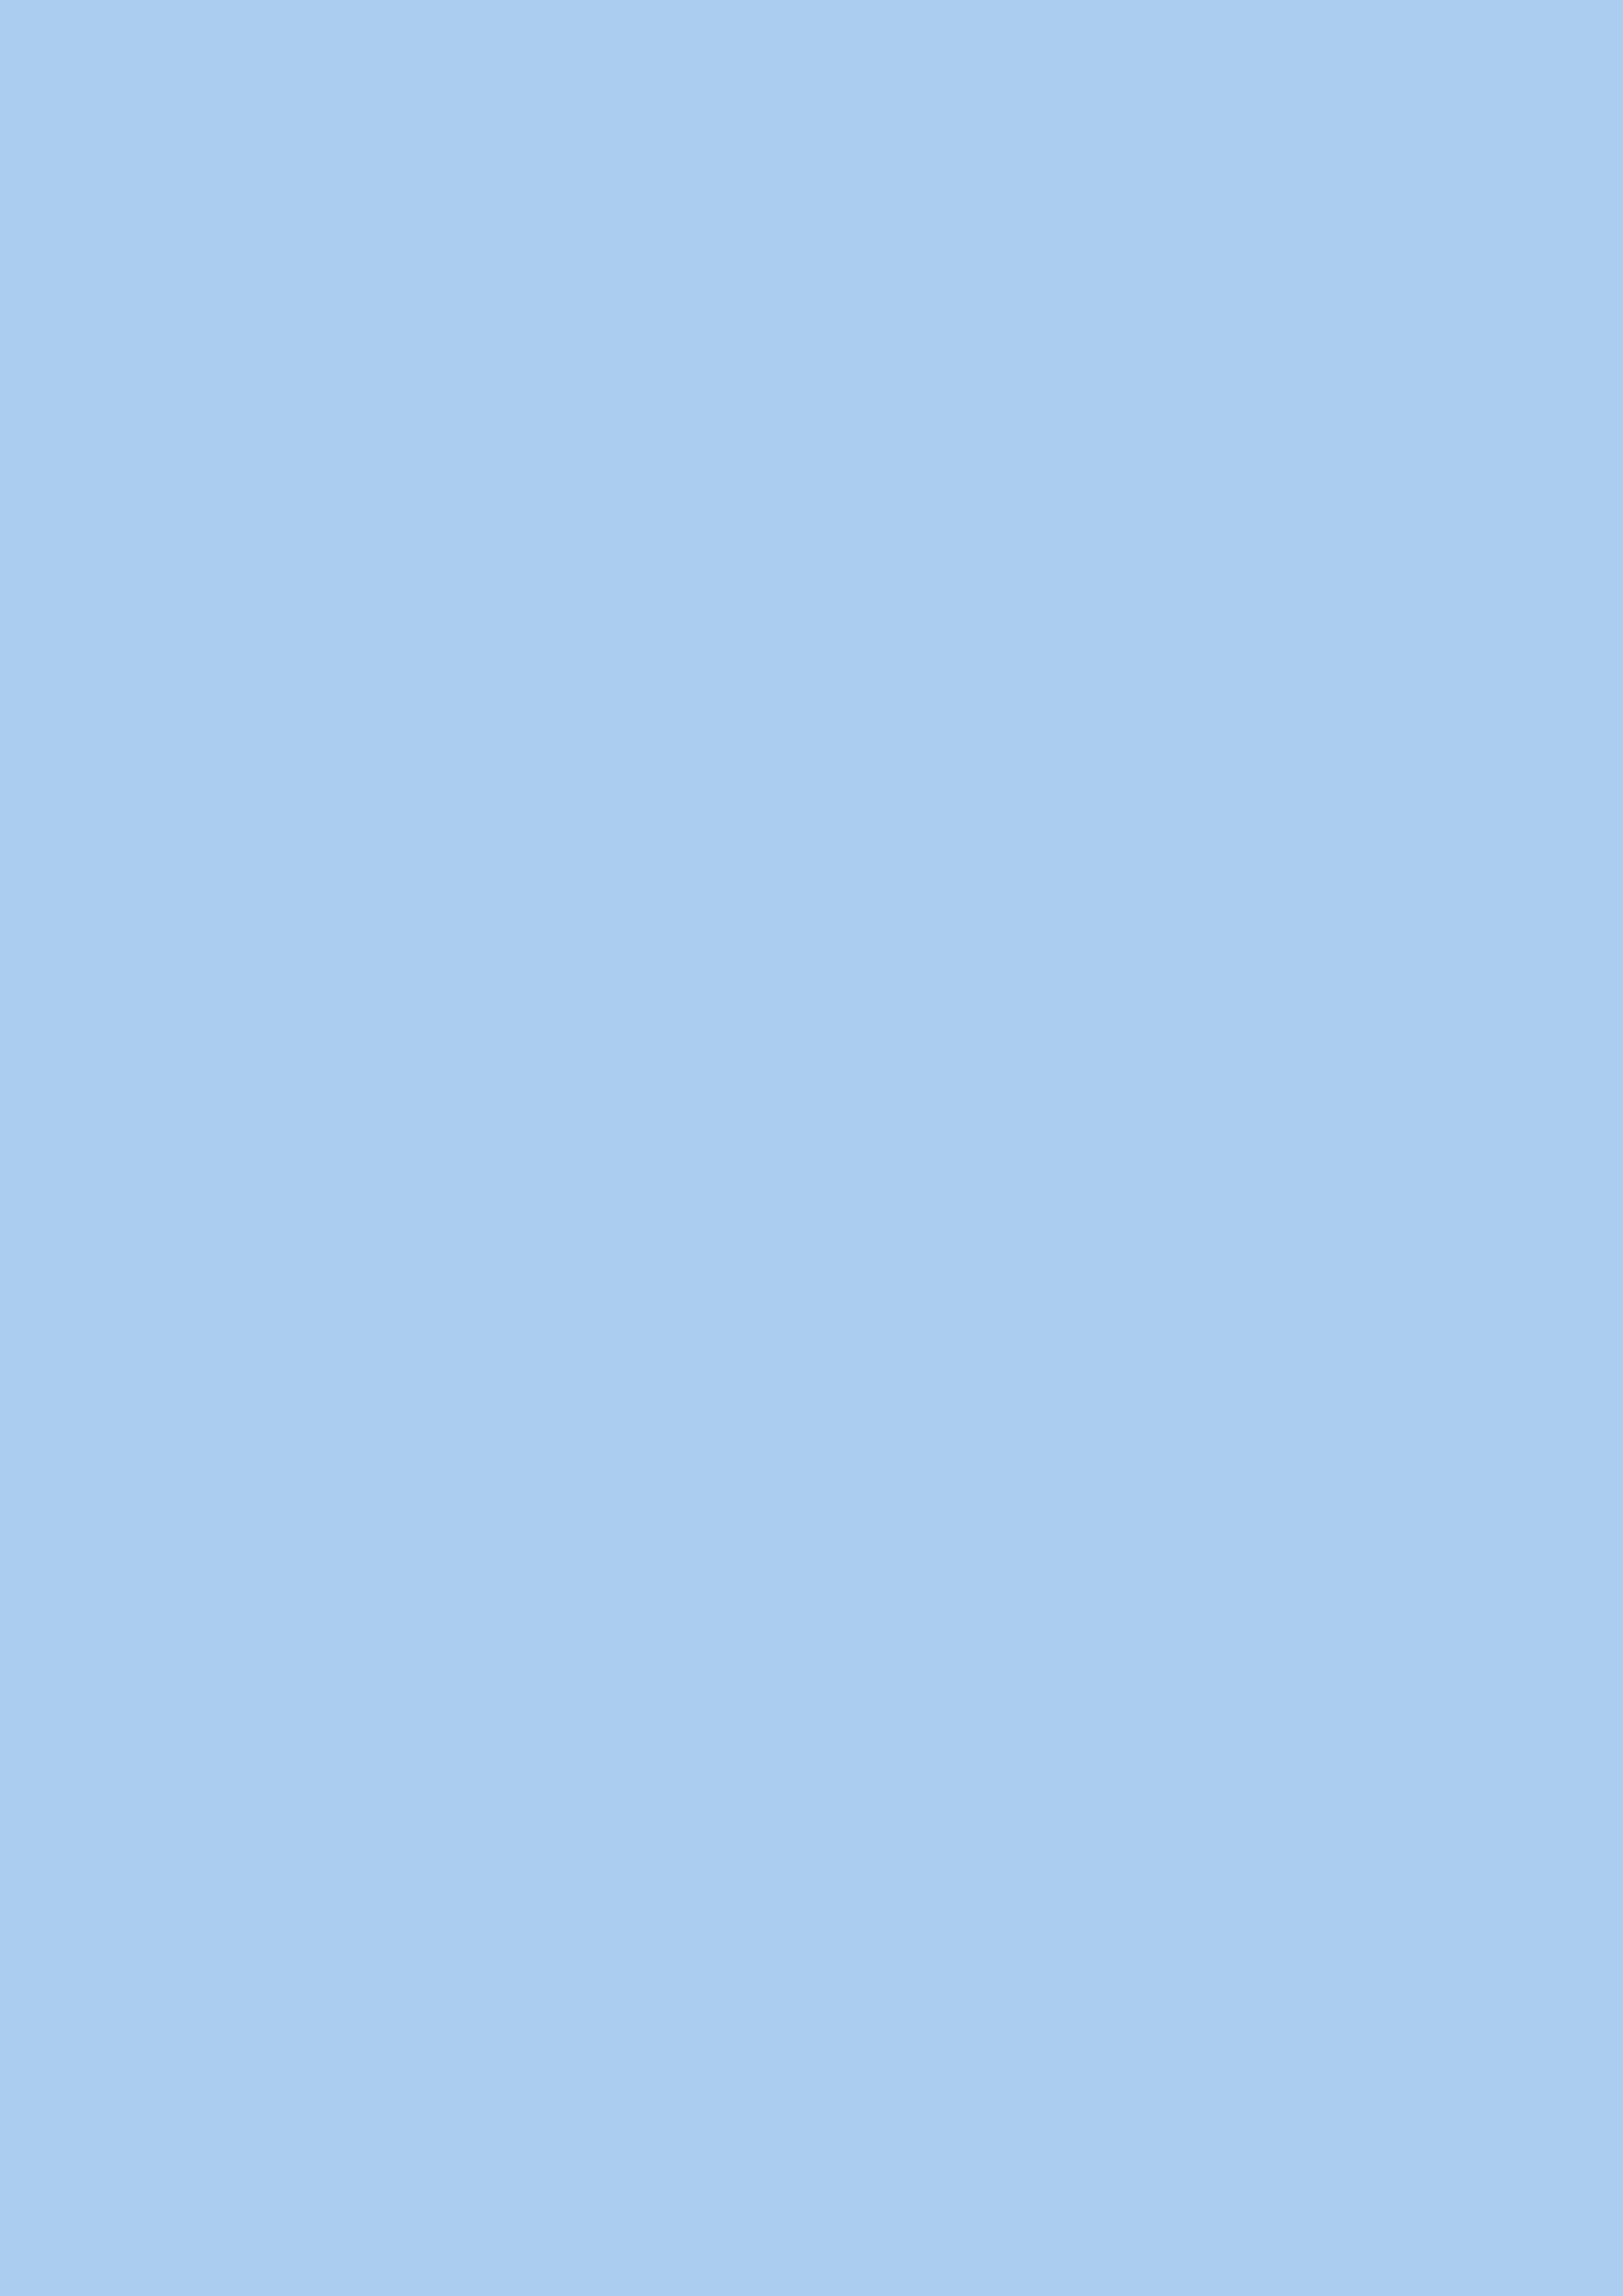 2480x3508 Pale Cornflower Blue Solid Color Background